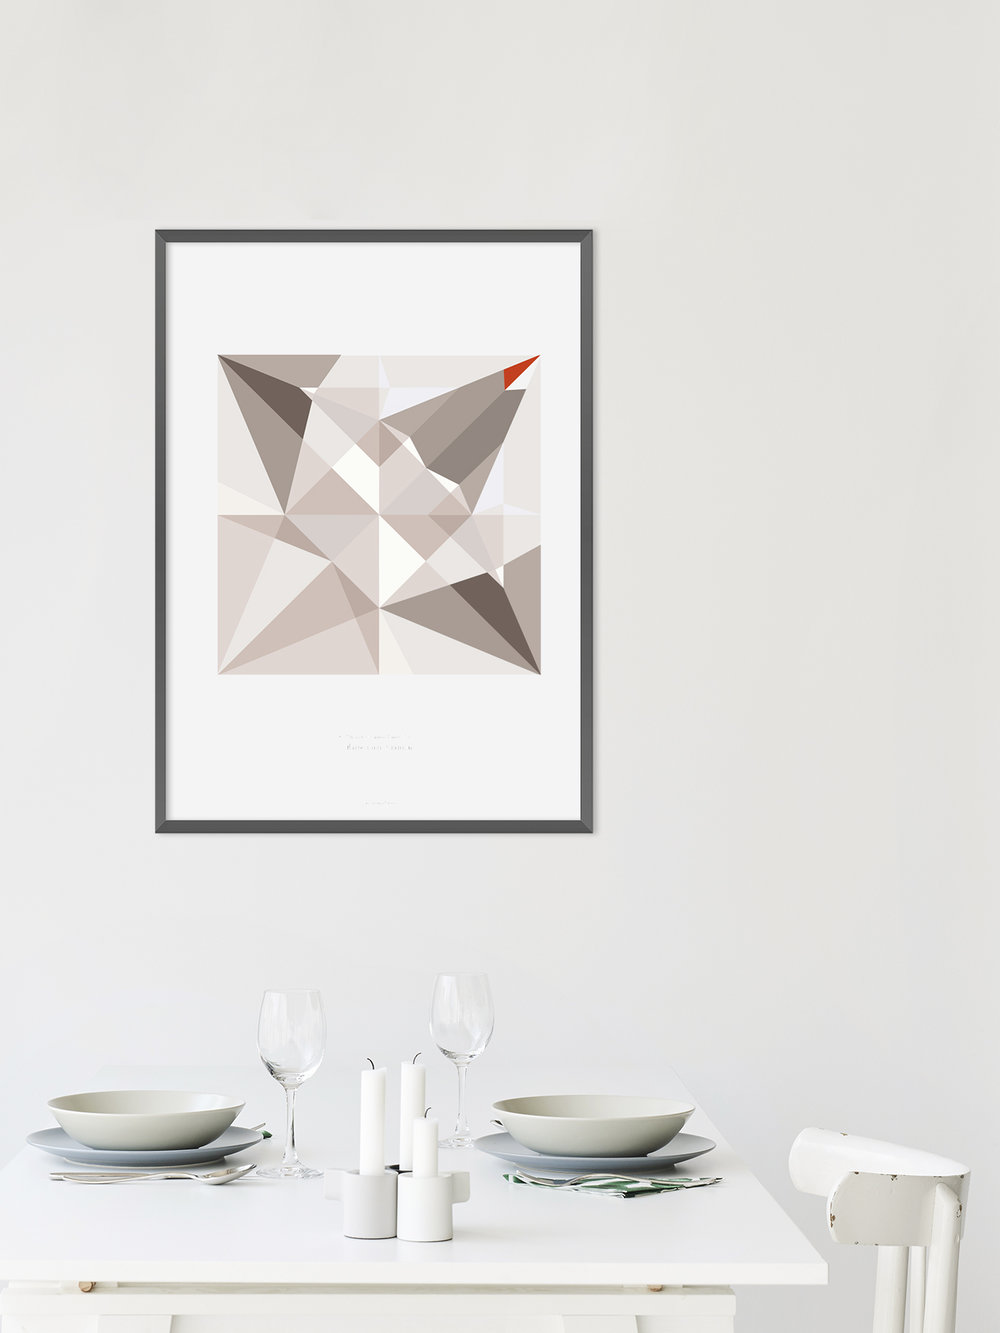 Origami Print Kranich, mehrfarbig  Origami print Crane, multicolored